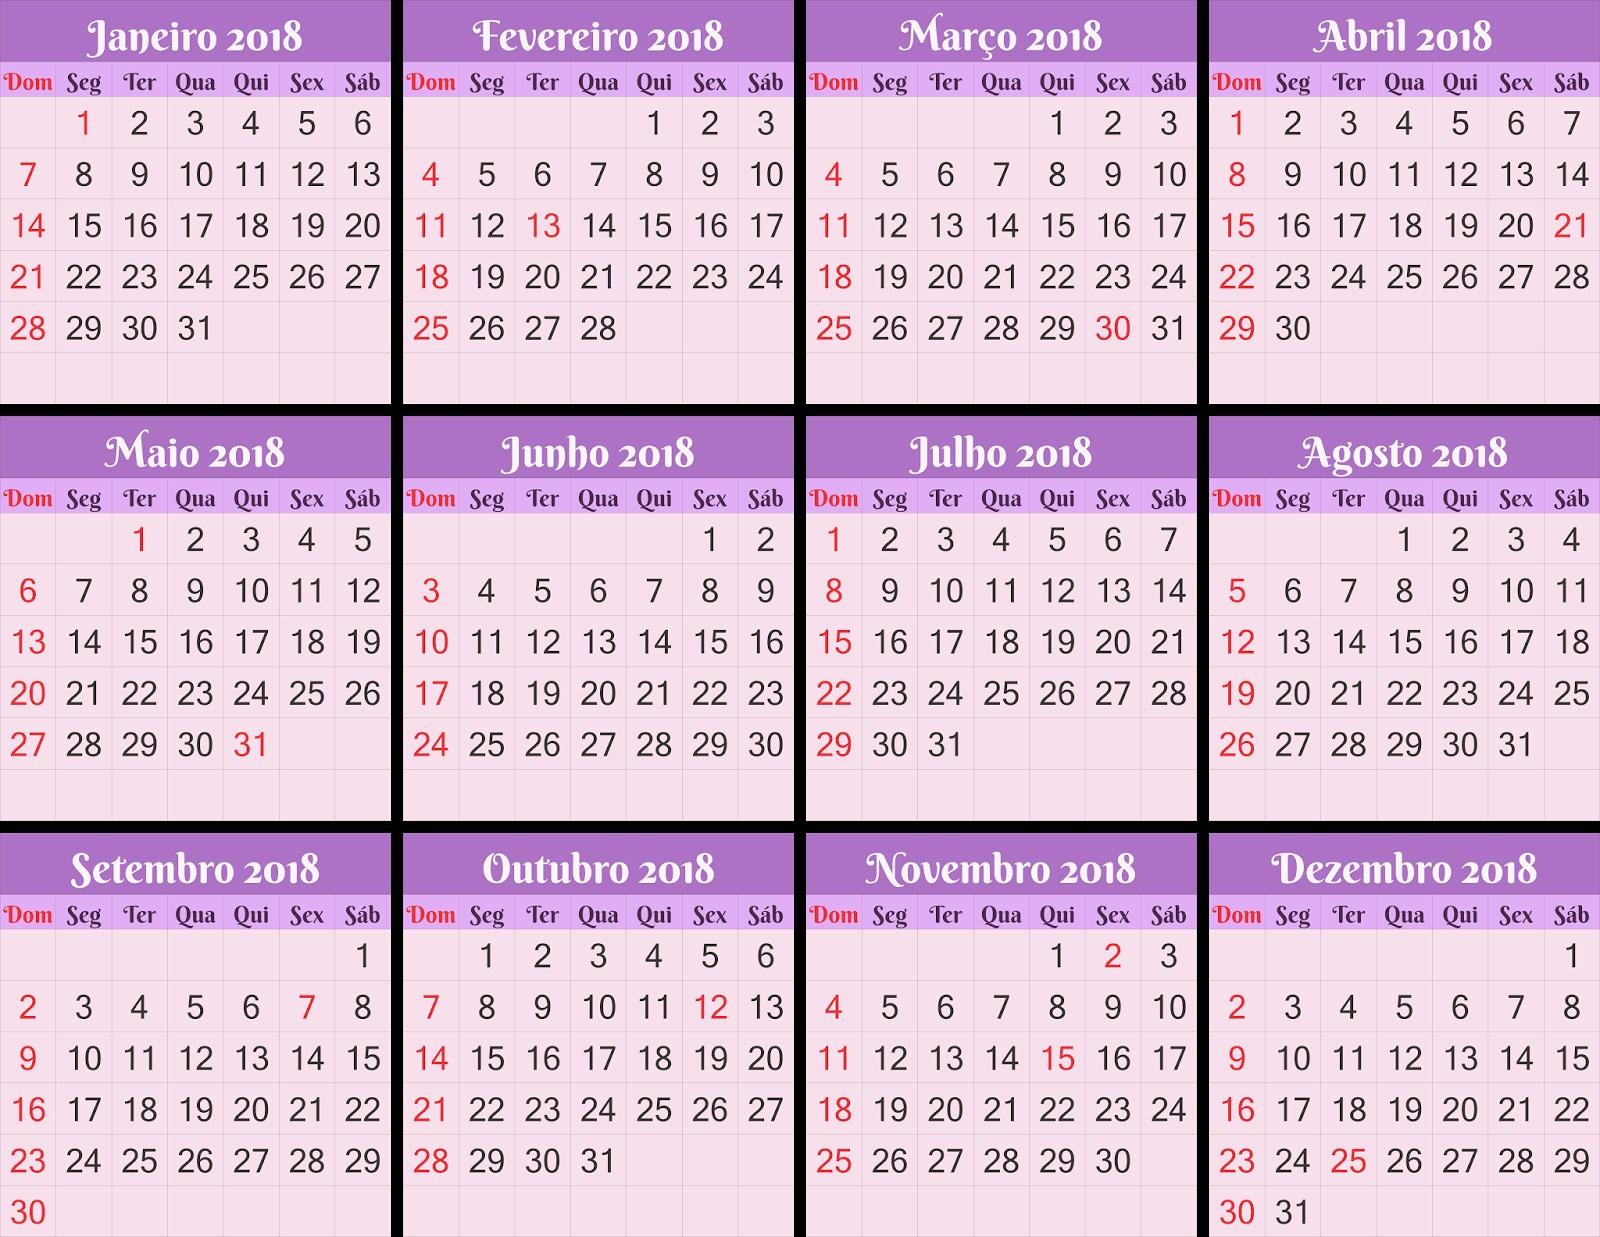 Calendario 2019 Imprimir Mr Wonderful Actual Calendário 2018 Psd Cdr Ai Pdf Base De Calendário 2018 Para Suas Of Calendario 2019 Imprimir Mr Wonderful Más Recientes Mr Wonderful Descargables Gran Recopilatorio